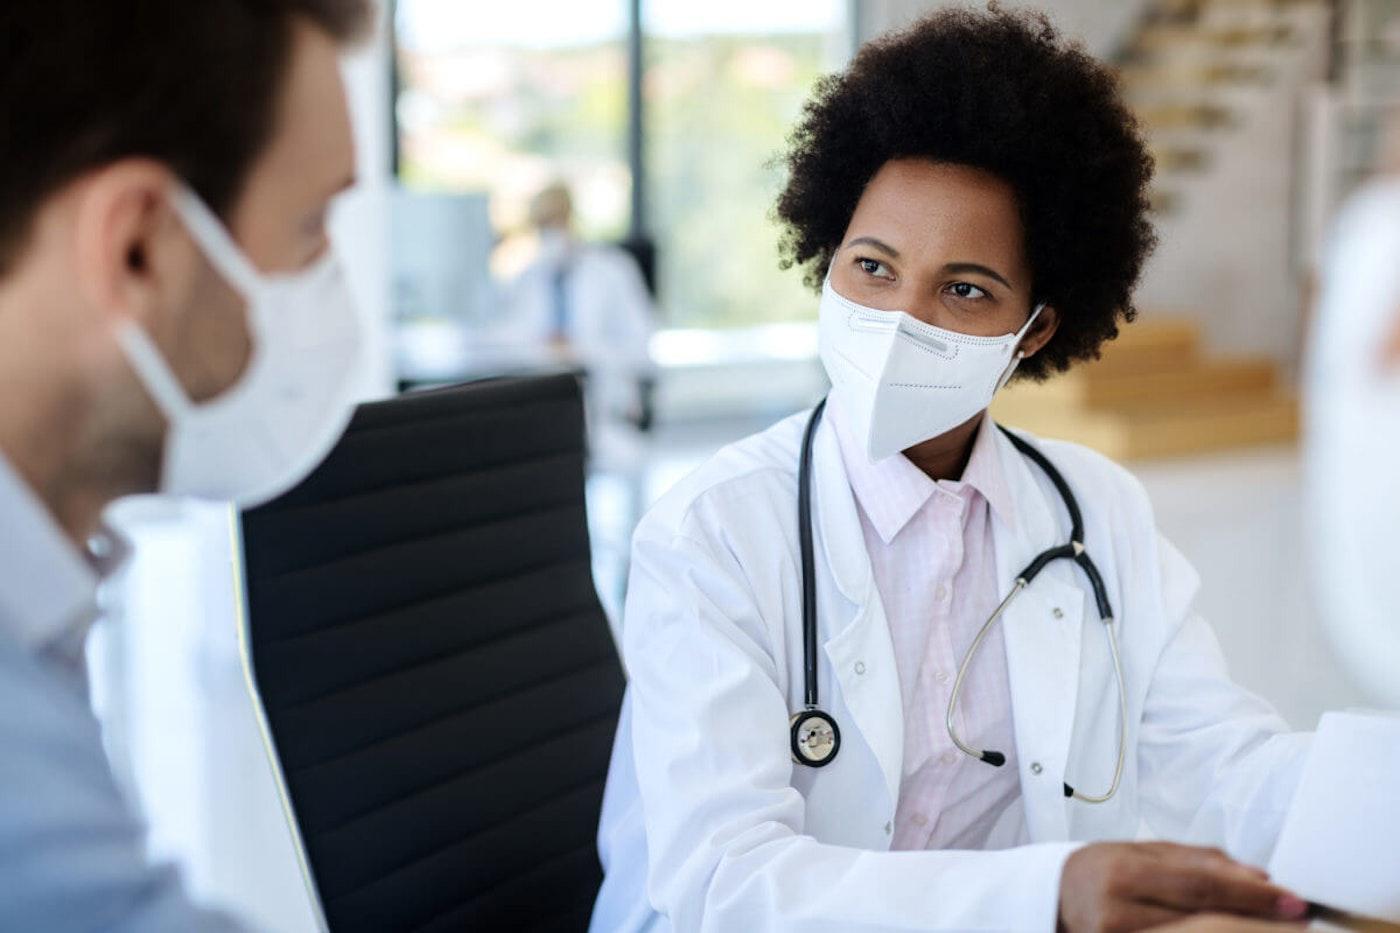 Open enrollment through Healthcare.gov is open until Dec. 15. Image via Shutterstock